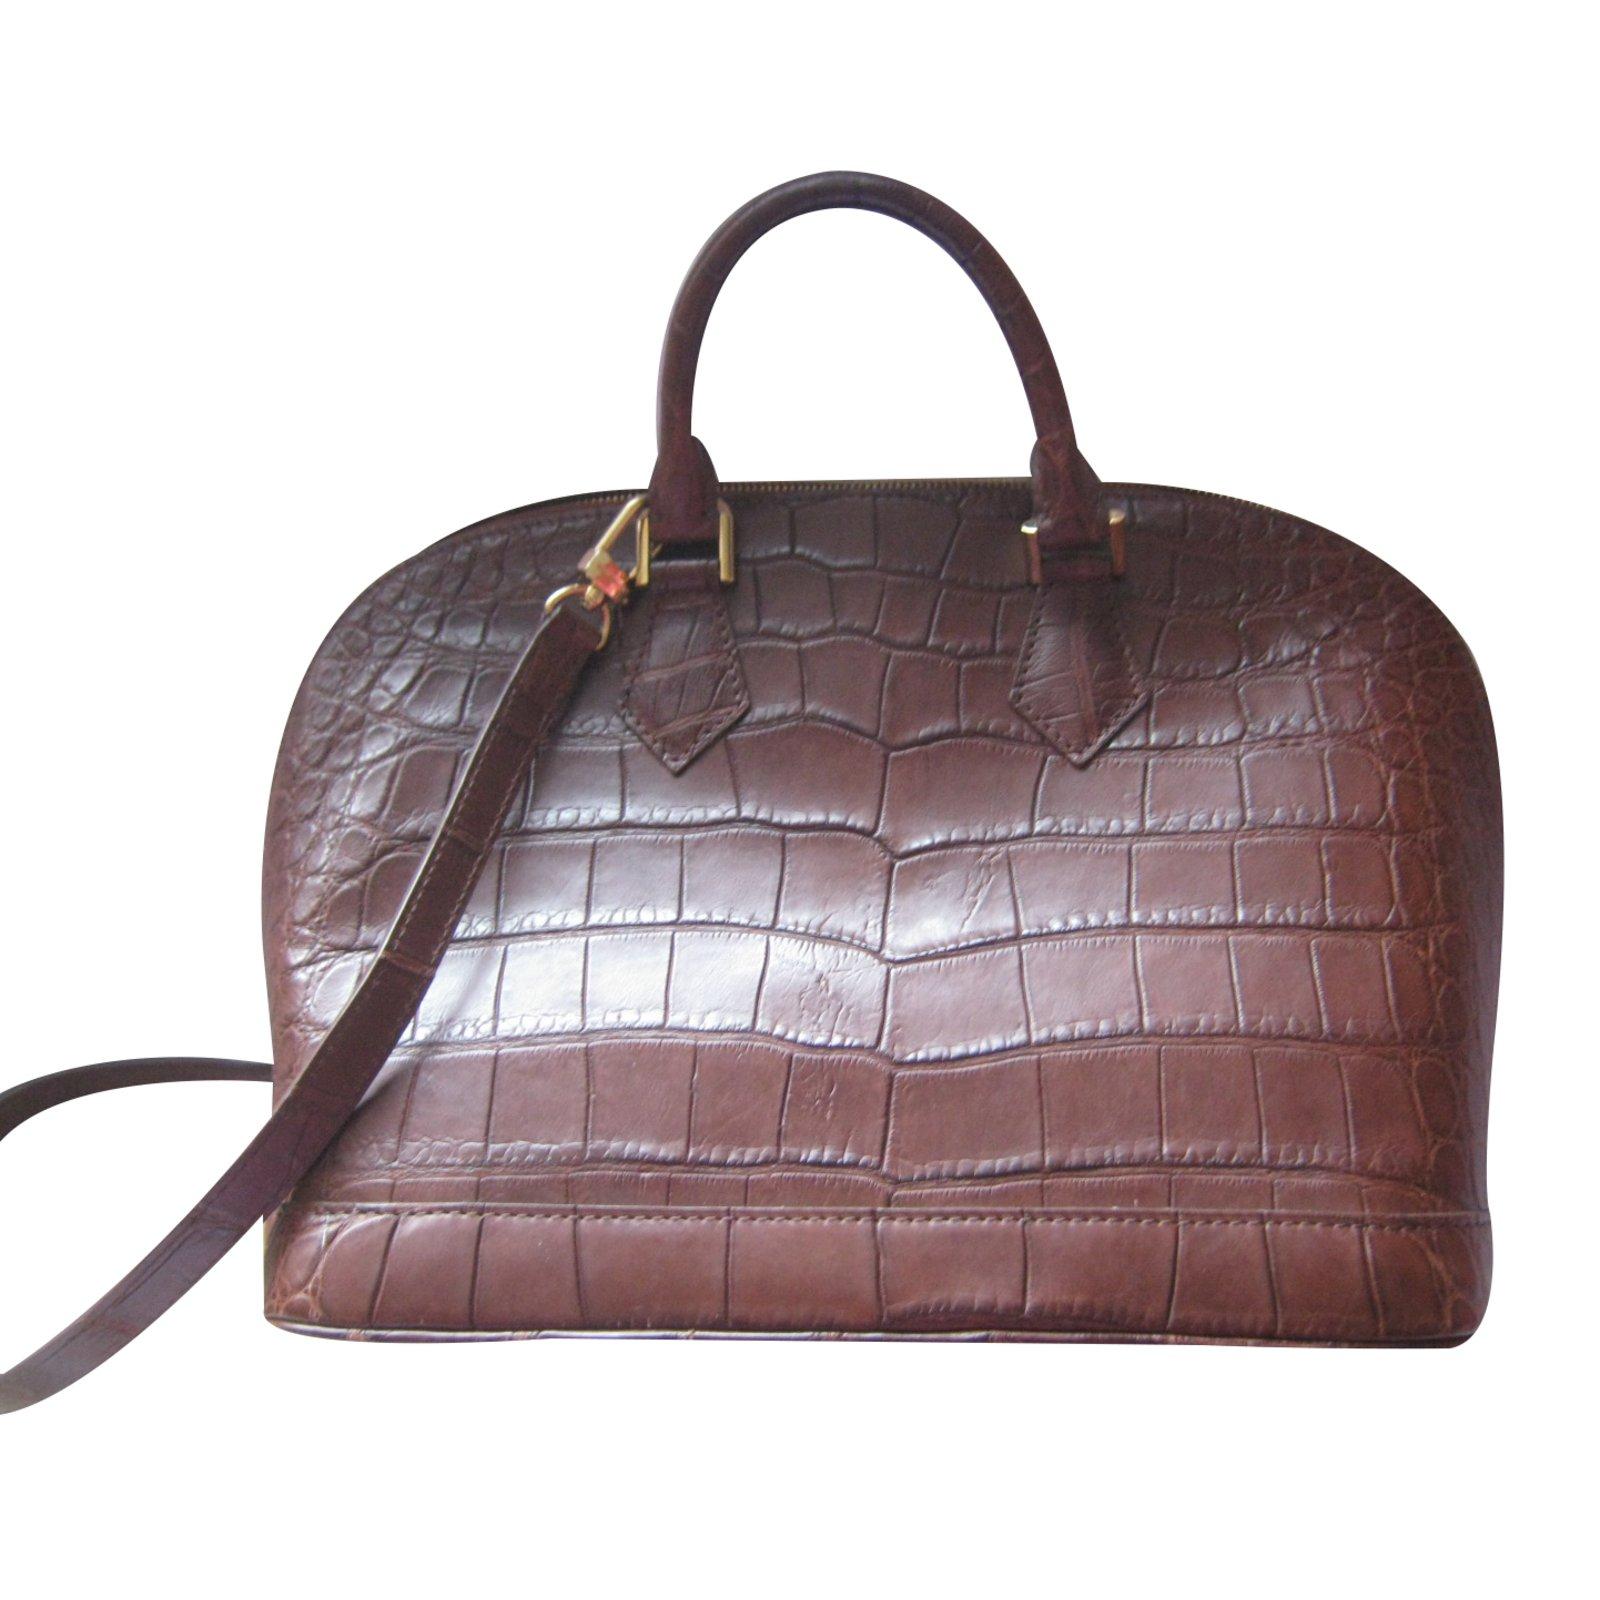 bacef731fd04 Louis Vuitton Alma Alligator Havane Matte Handbags Exotic leather Brown  ref.35429